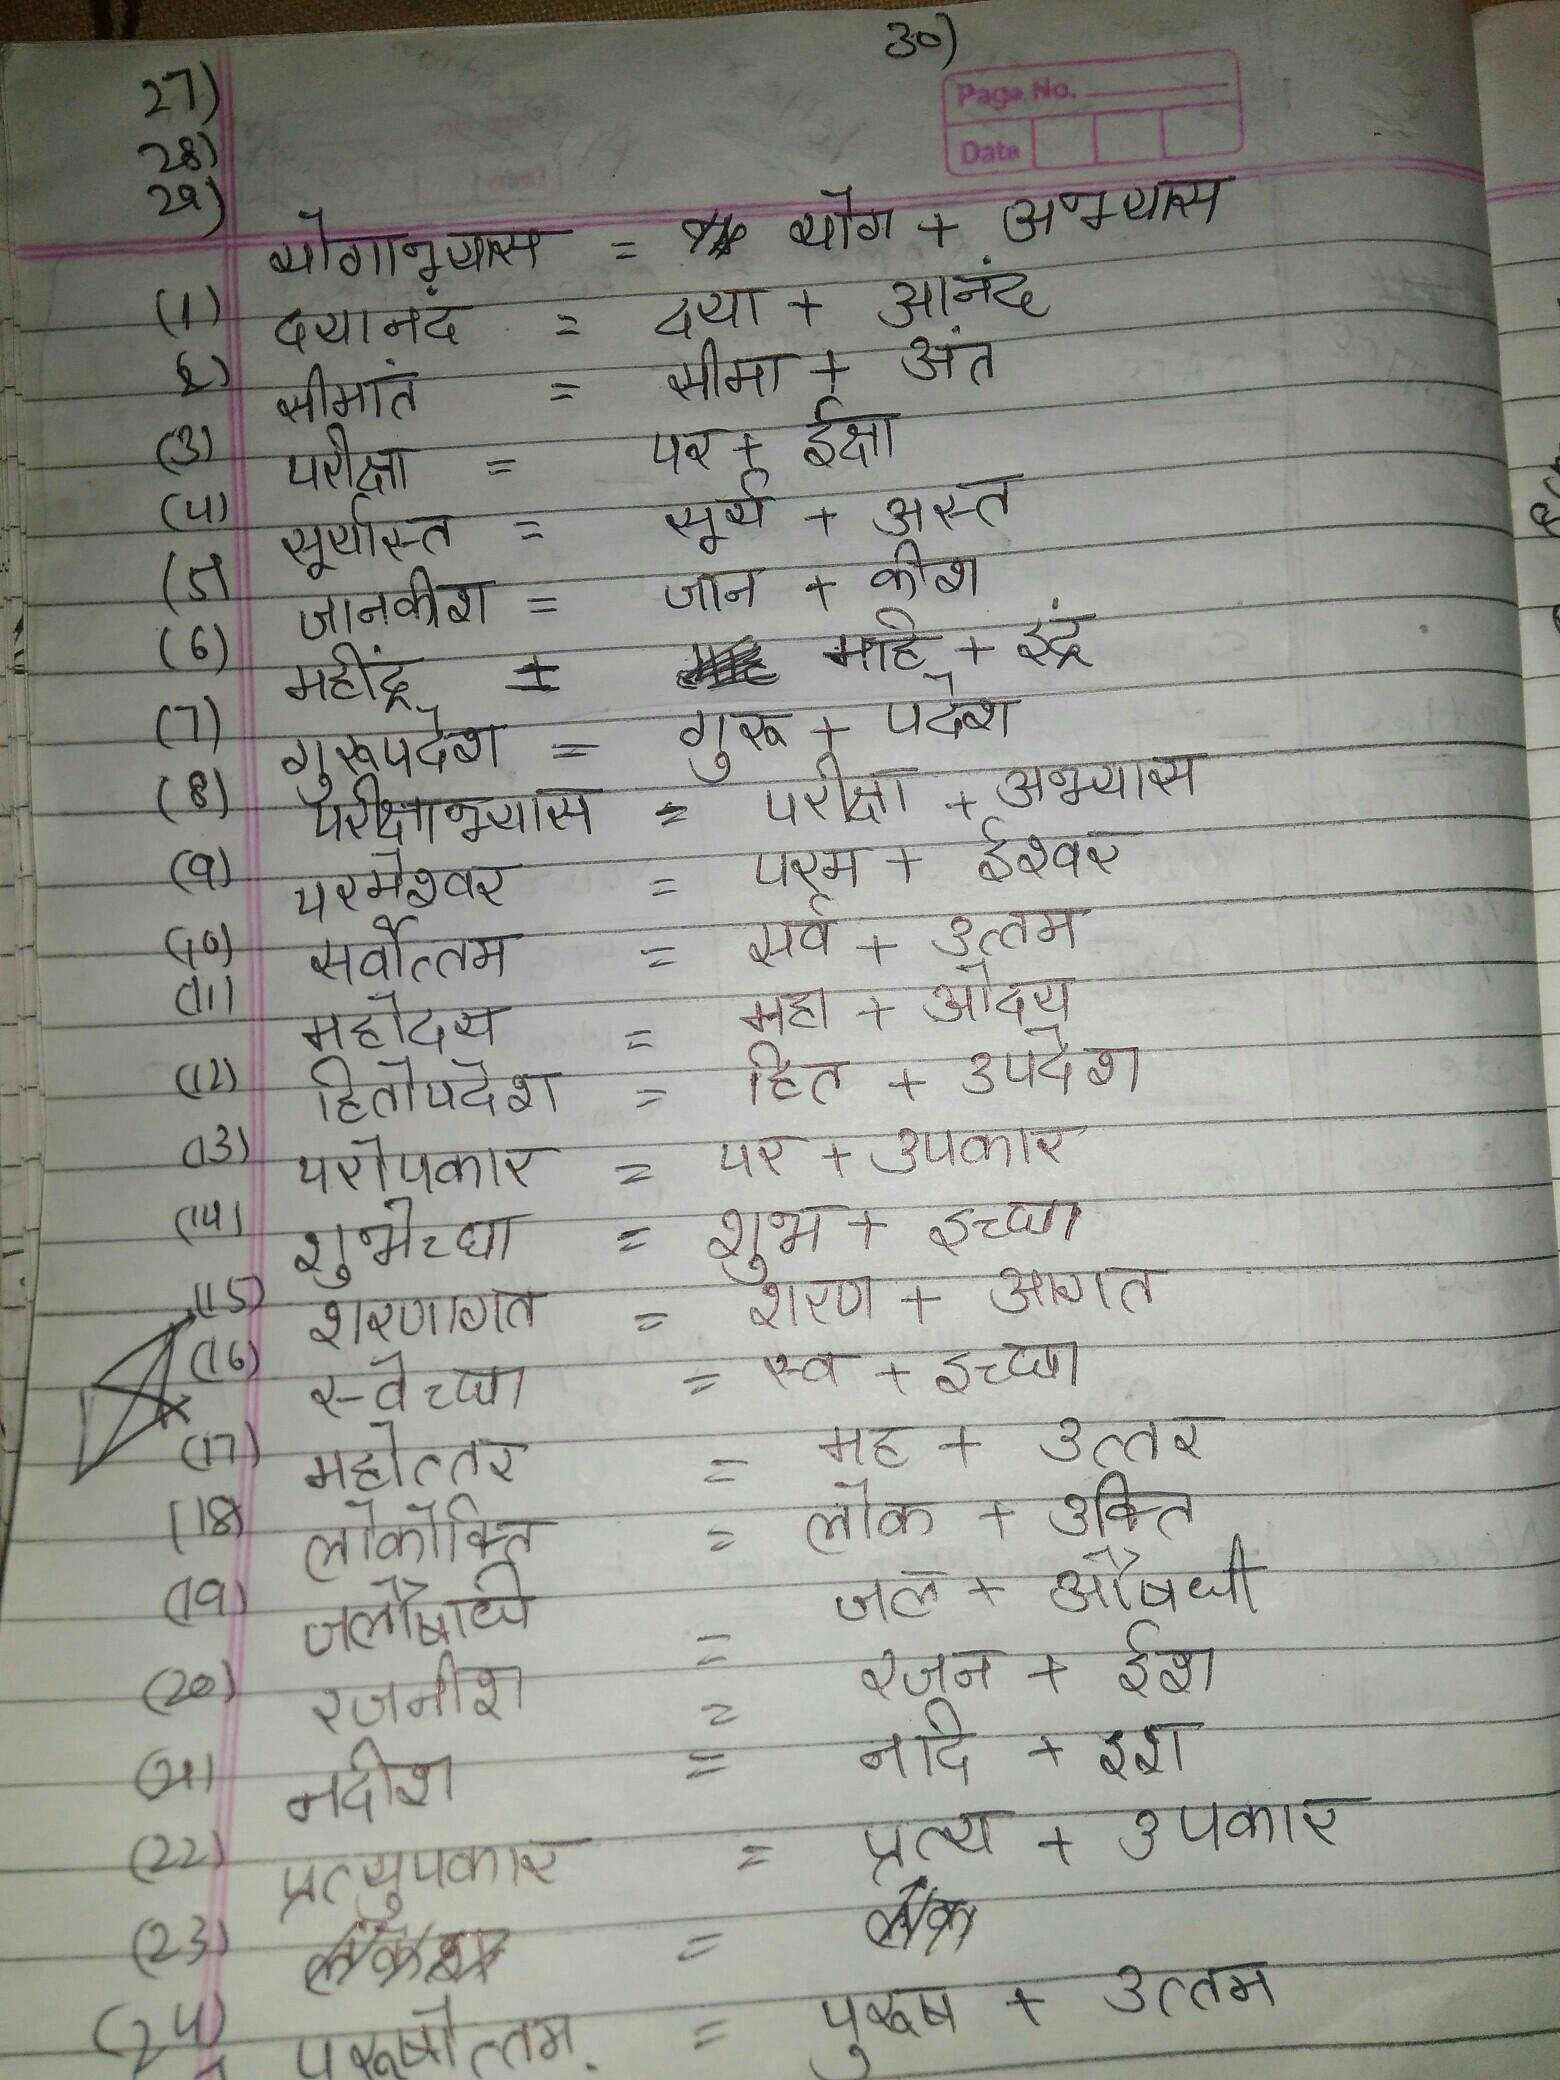 Swar Sandhi Ndhi Viched Hindi Grammar Worksheet